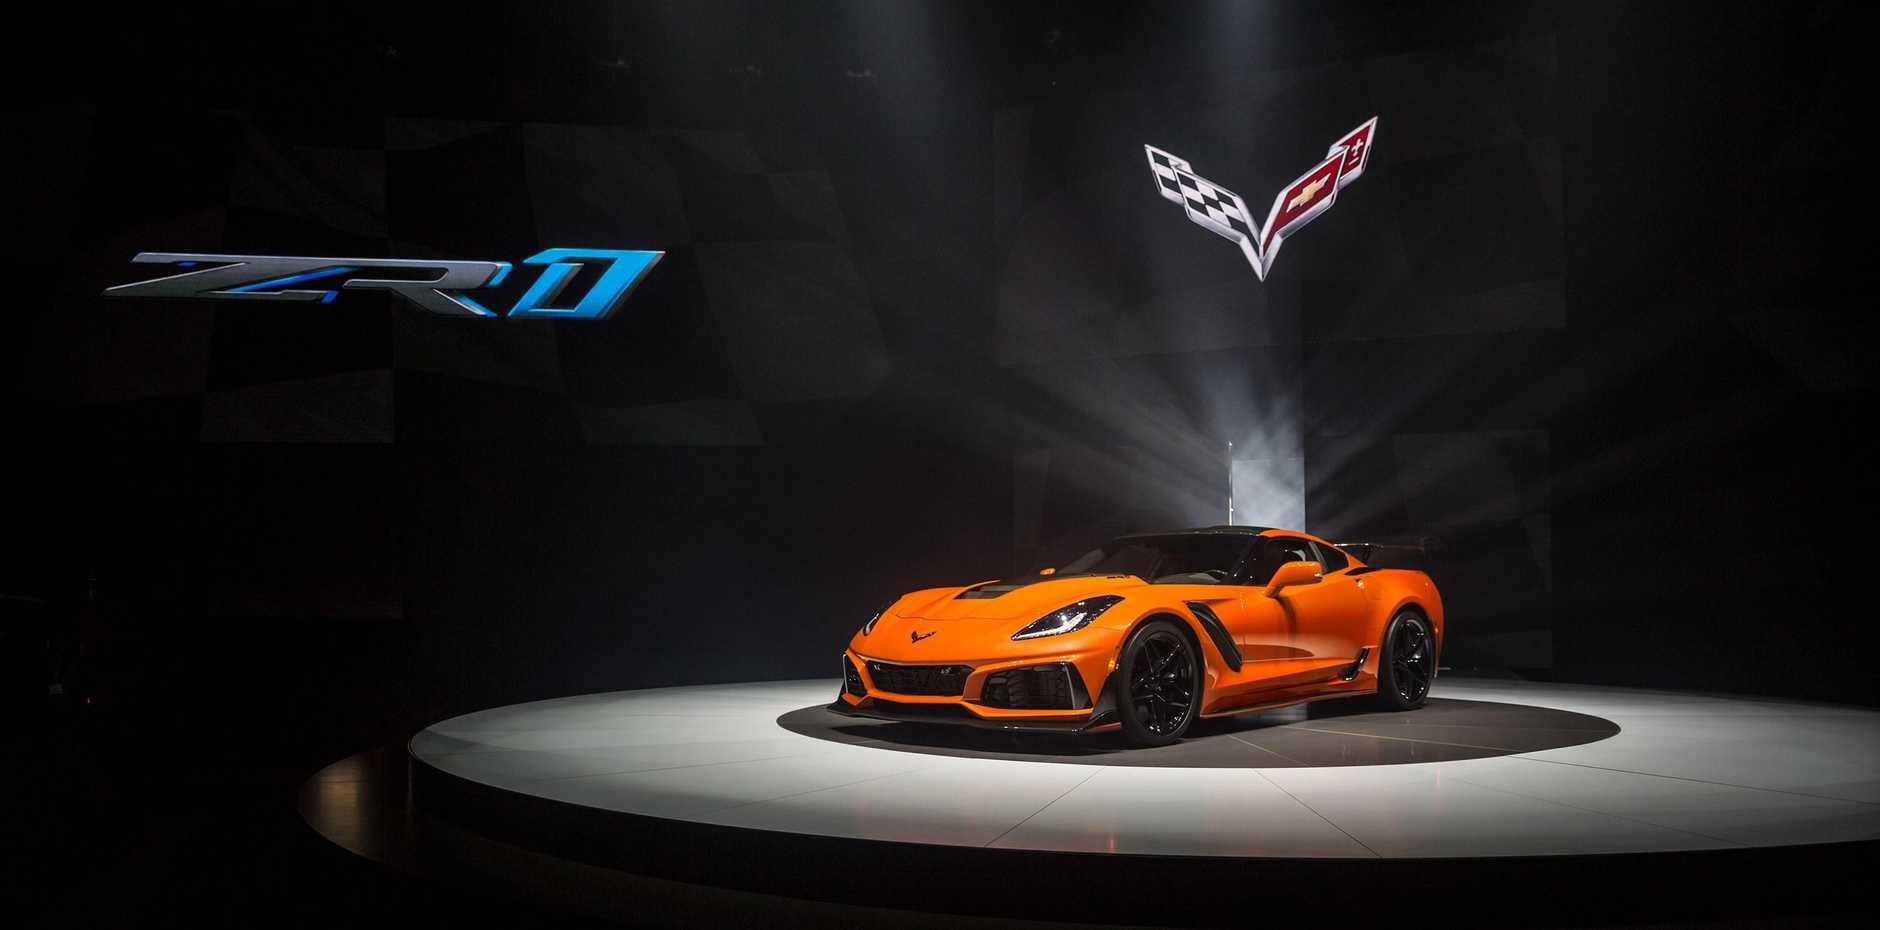 The launch of the 2019 Chevrolet Corvette.